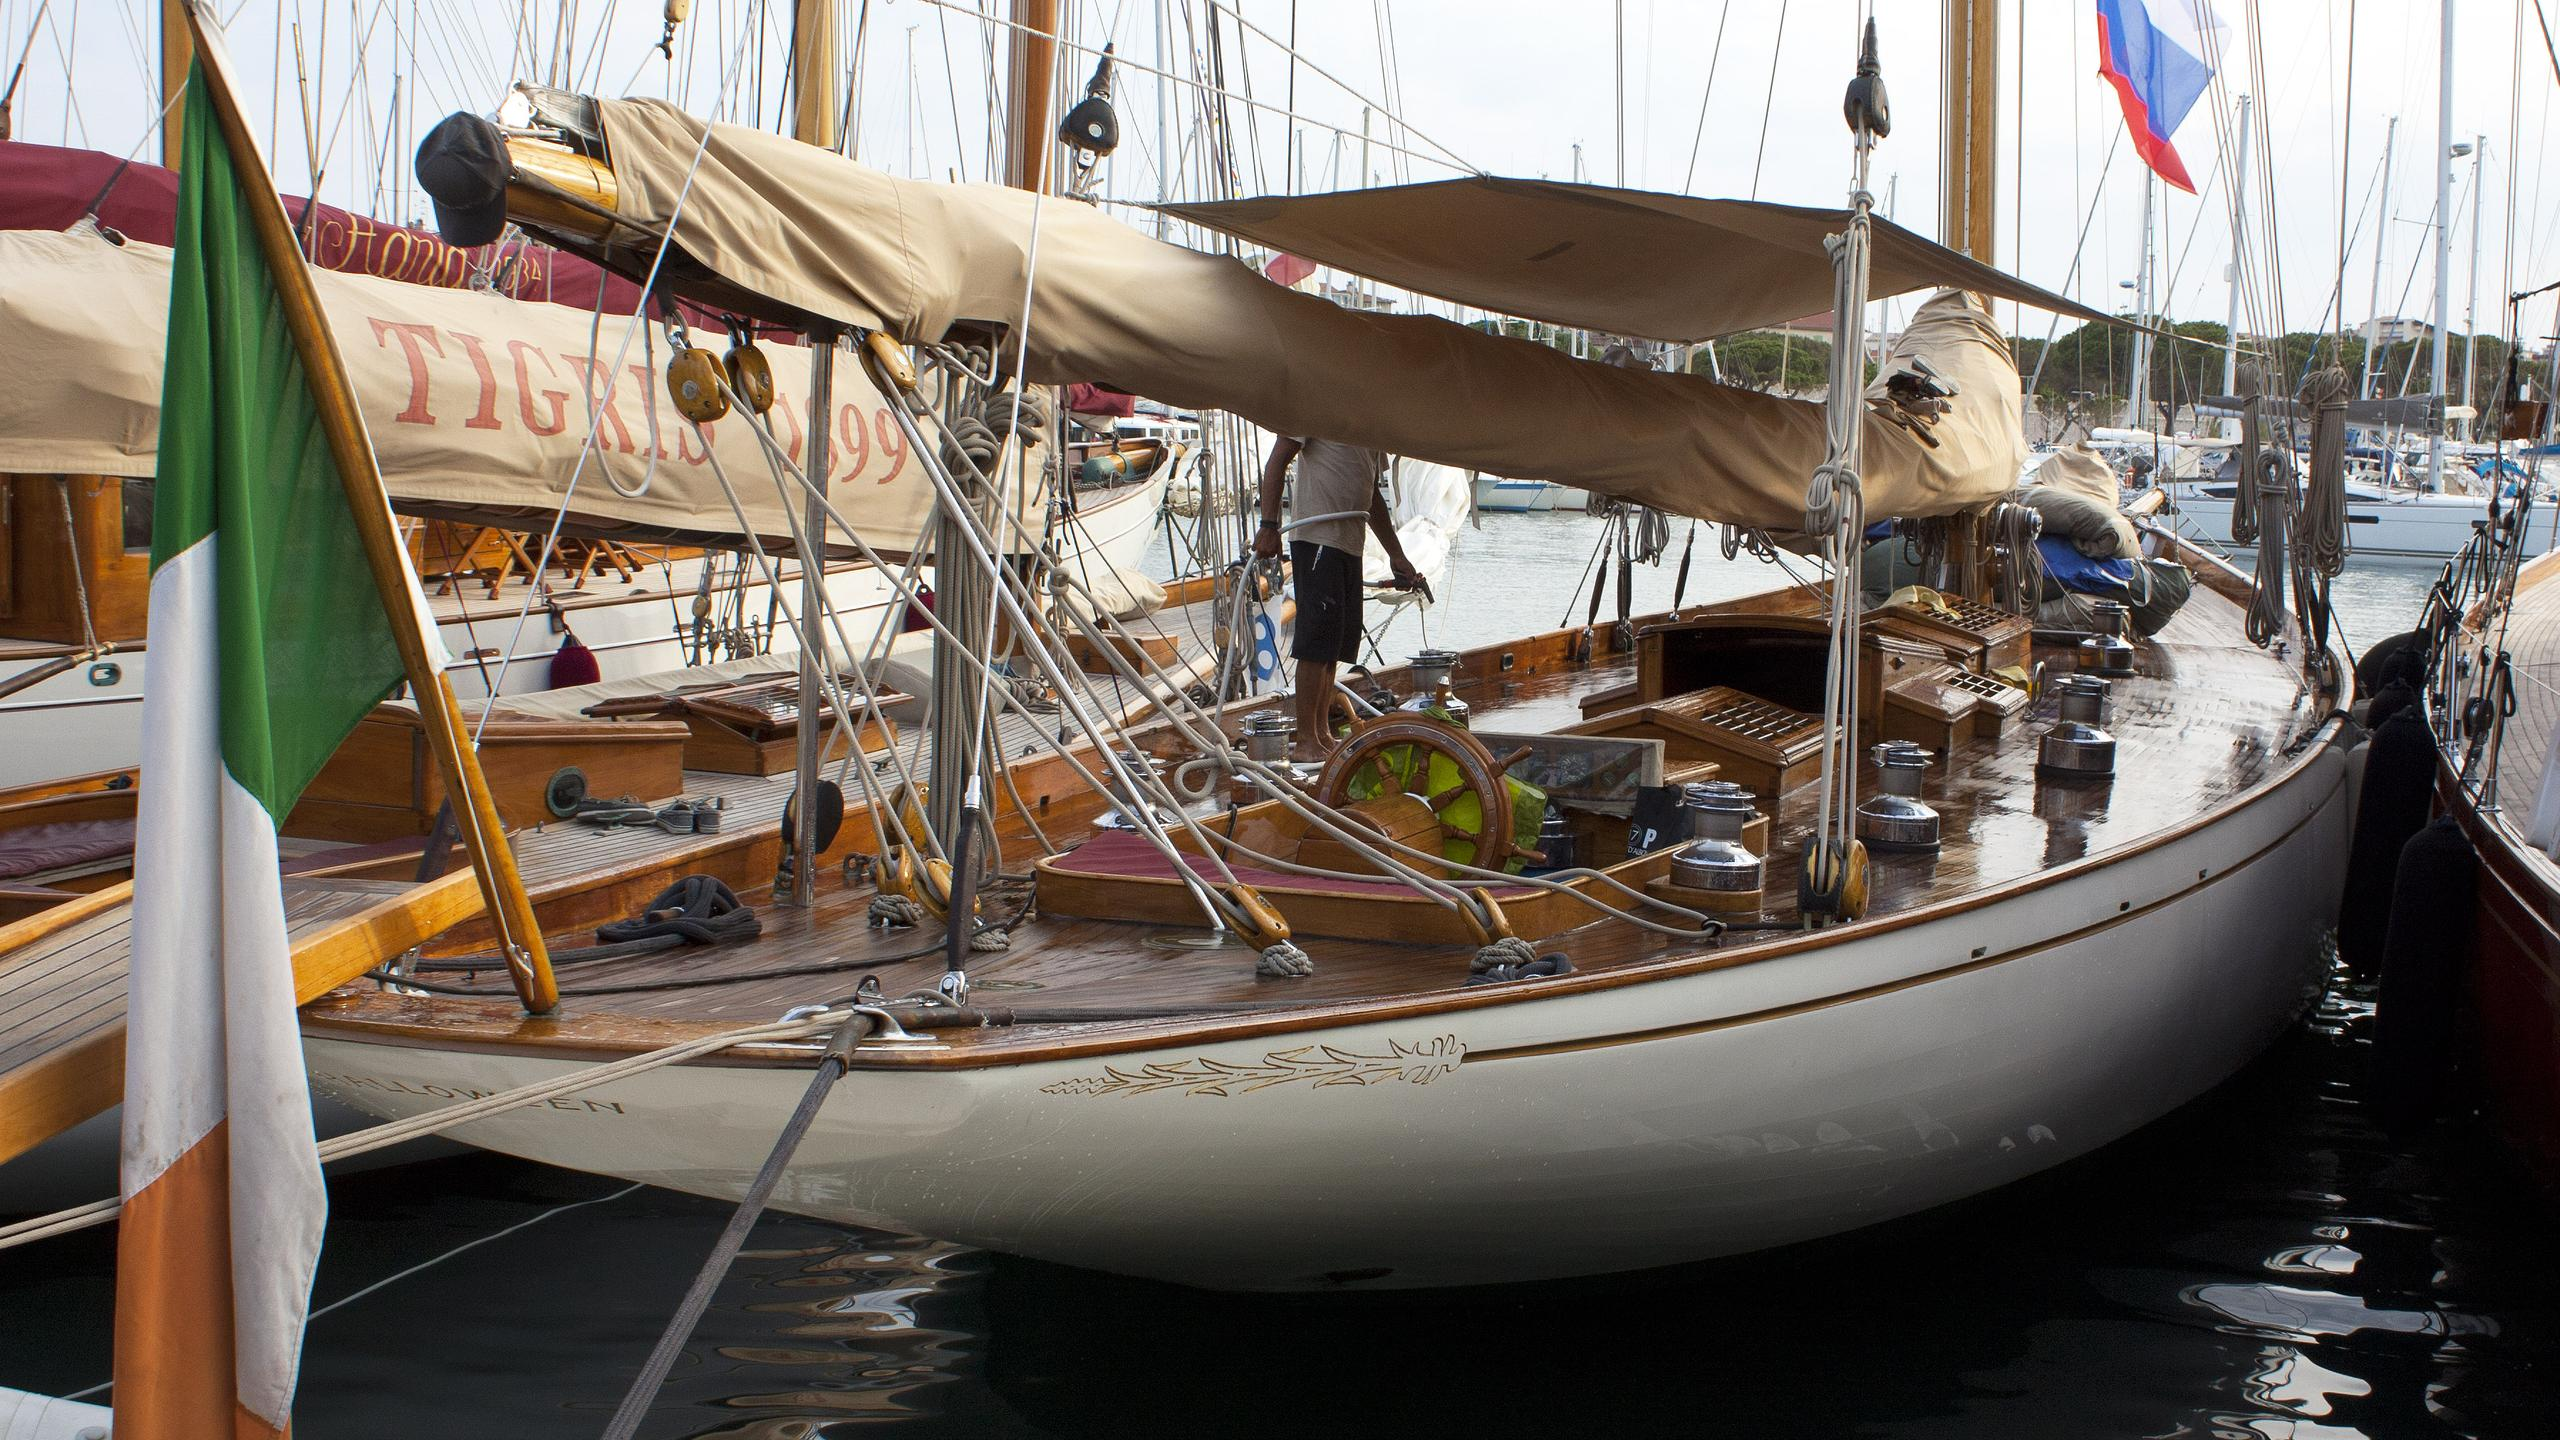 halloween-sailing-yacht-fife-1926-25m-stern